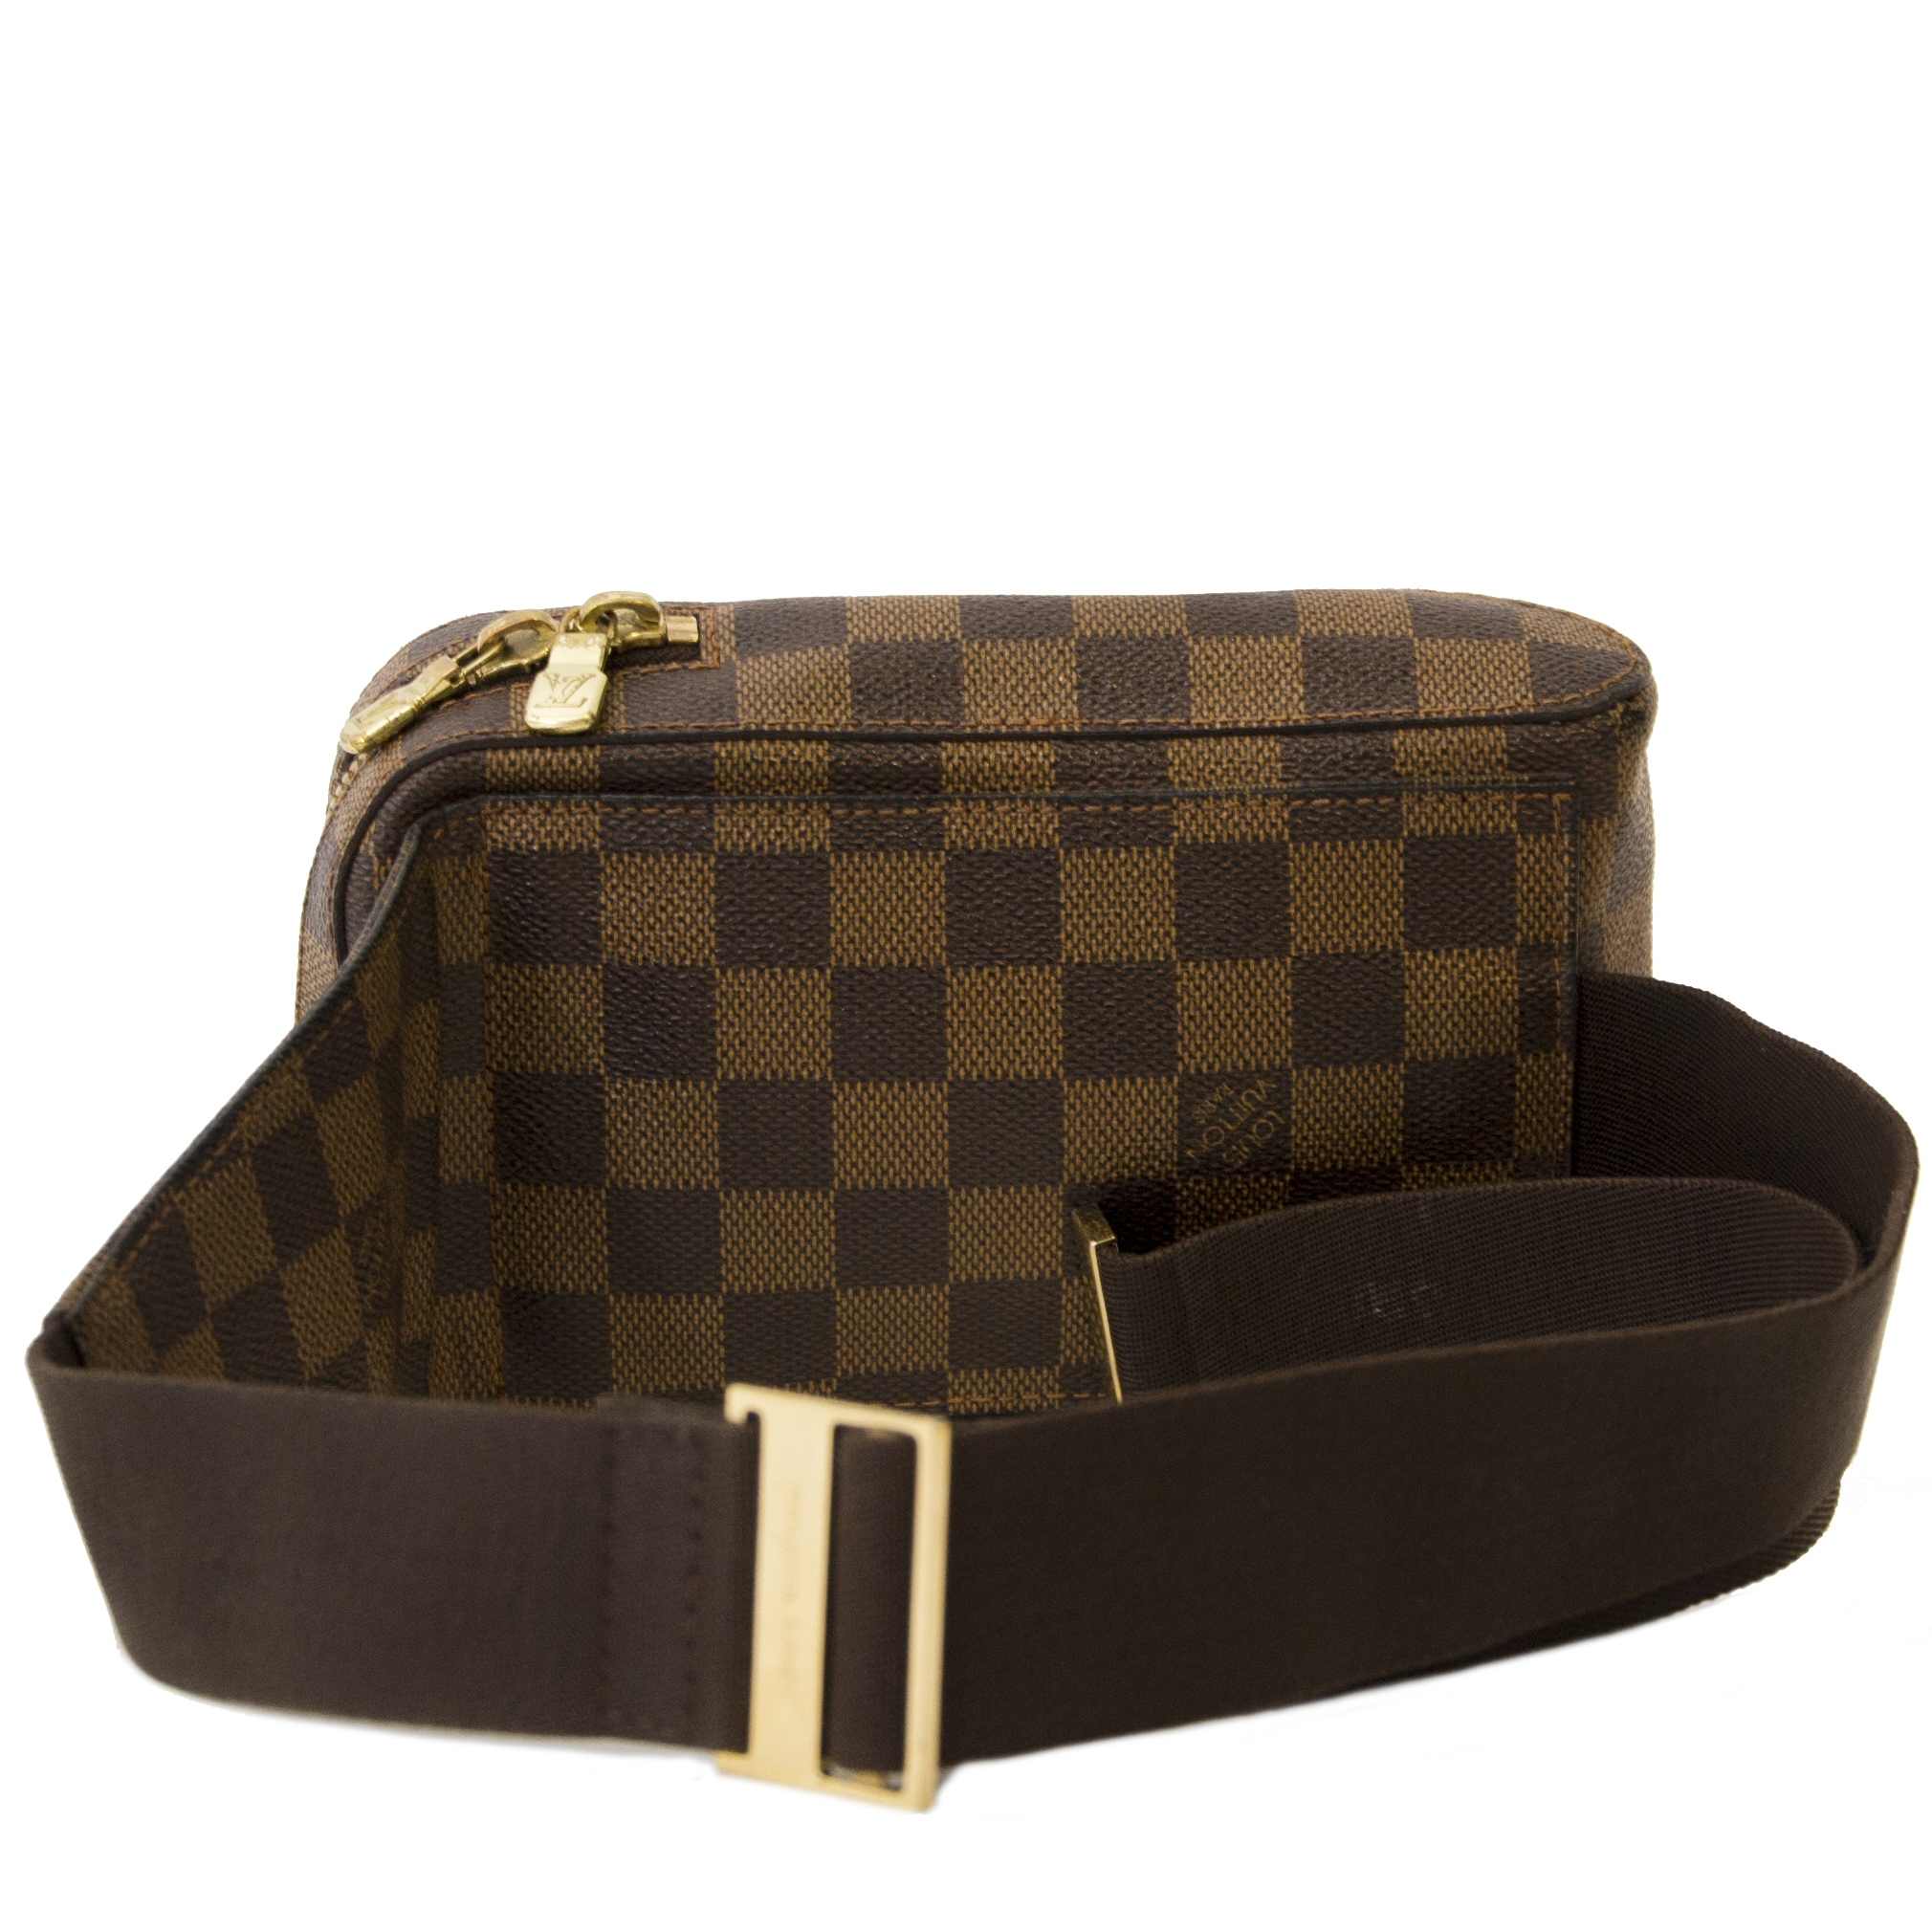 Louis Vuitton Brown Damier Ebene Geronimos Waist Bag